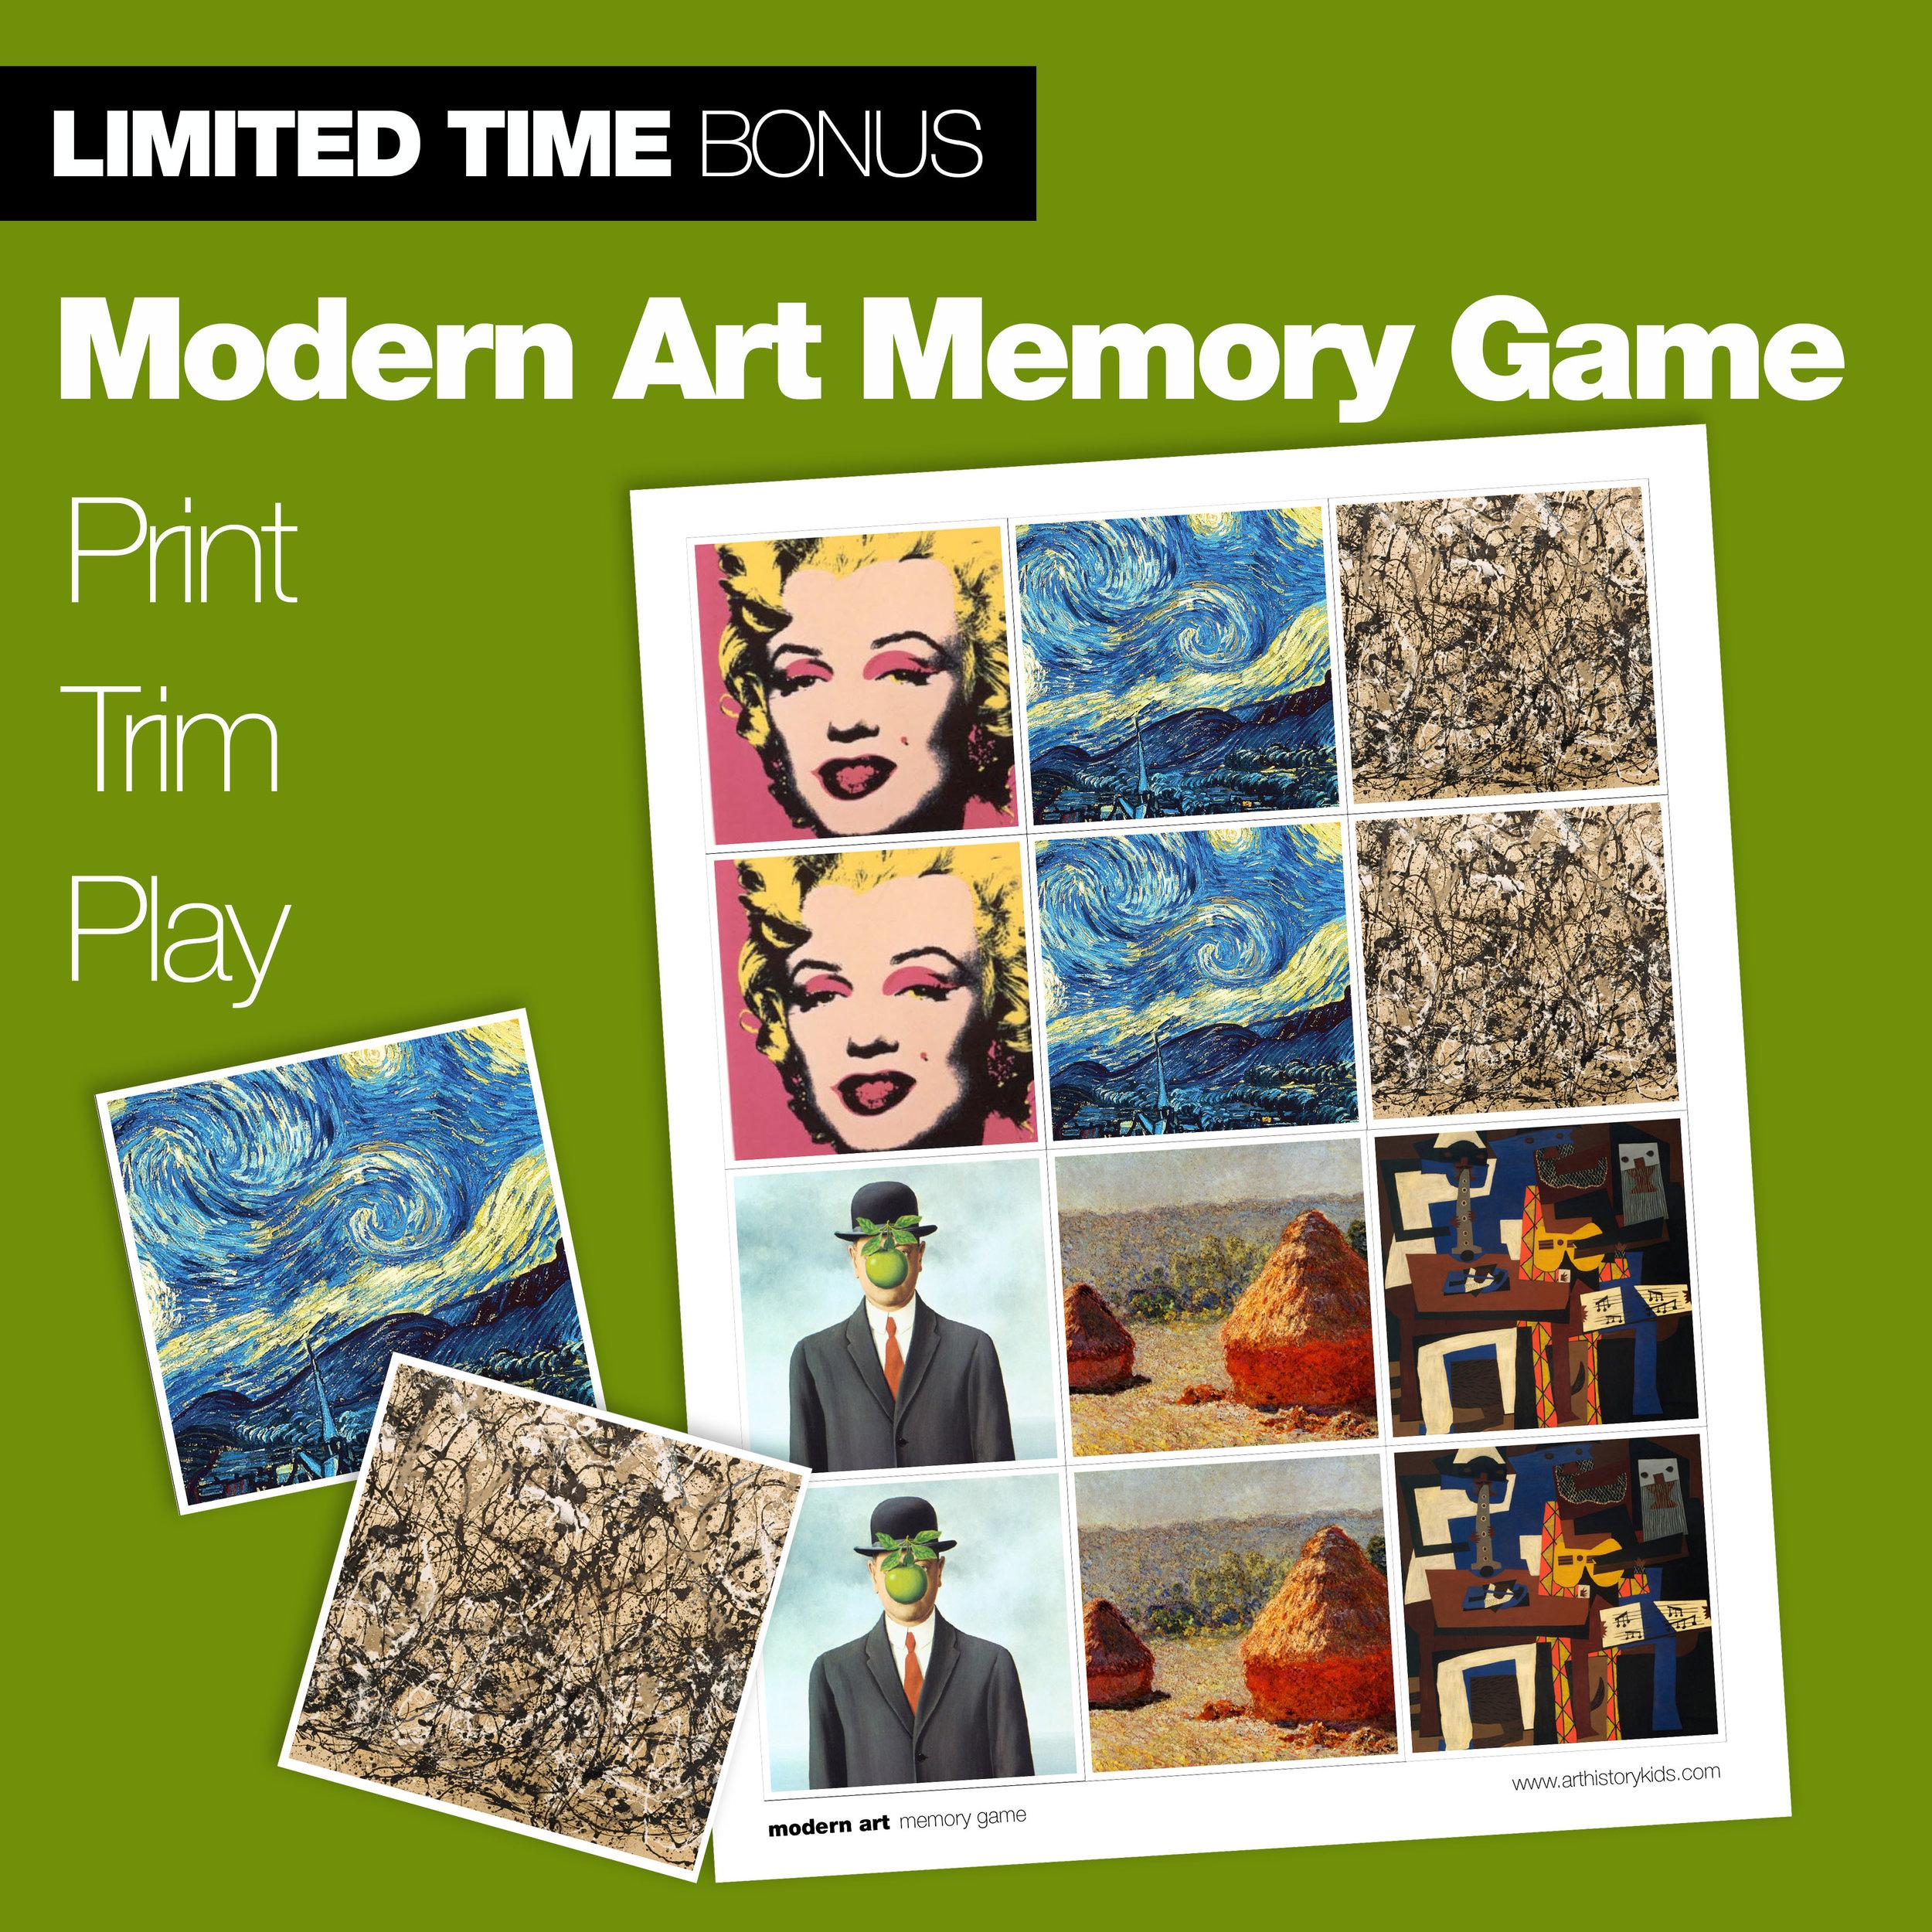 The Modern Art Memory Game